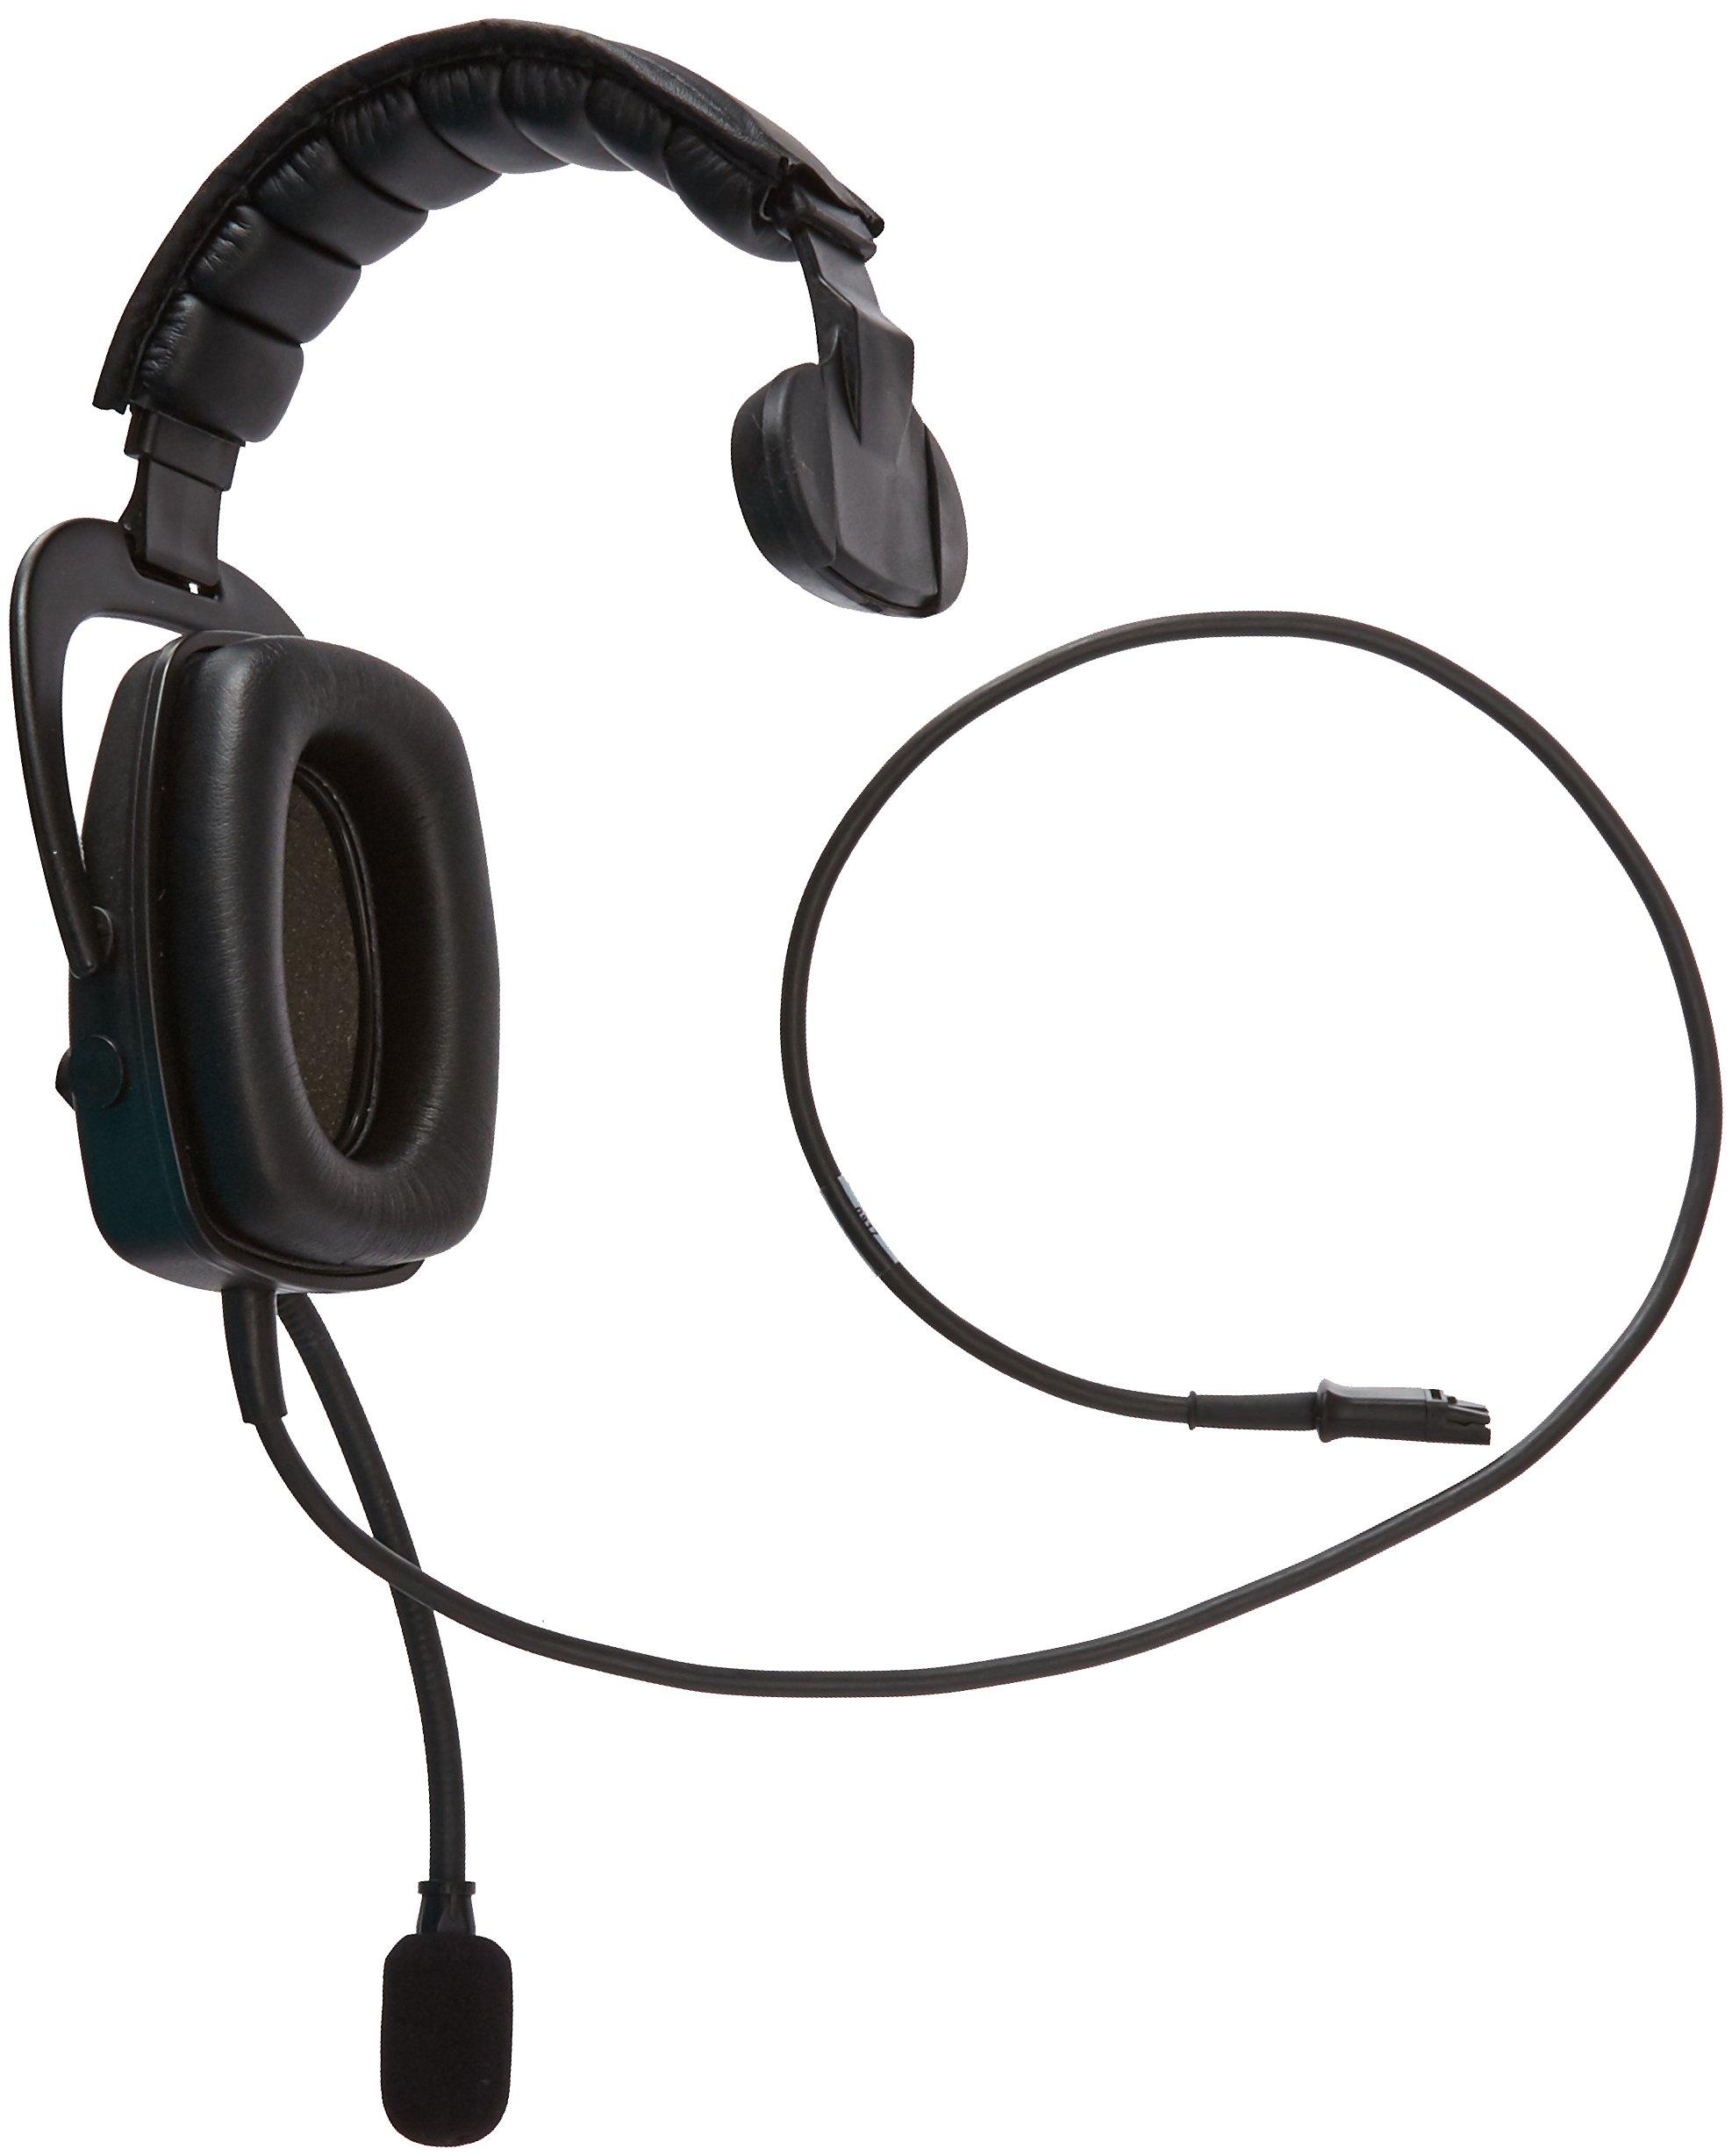 Plantronics 92082-01 Wired Headset, Black